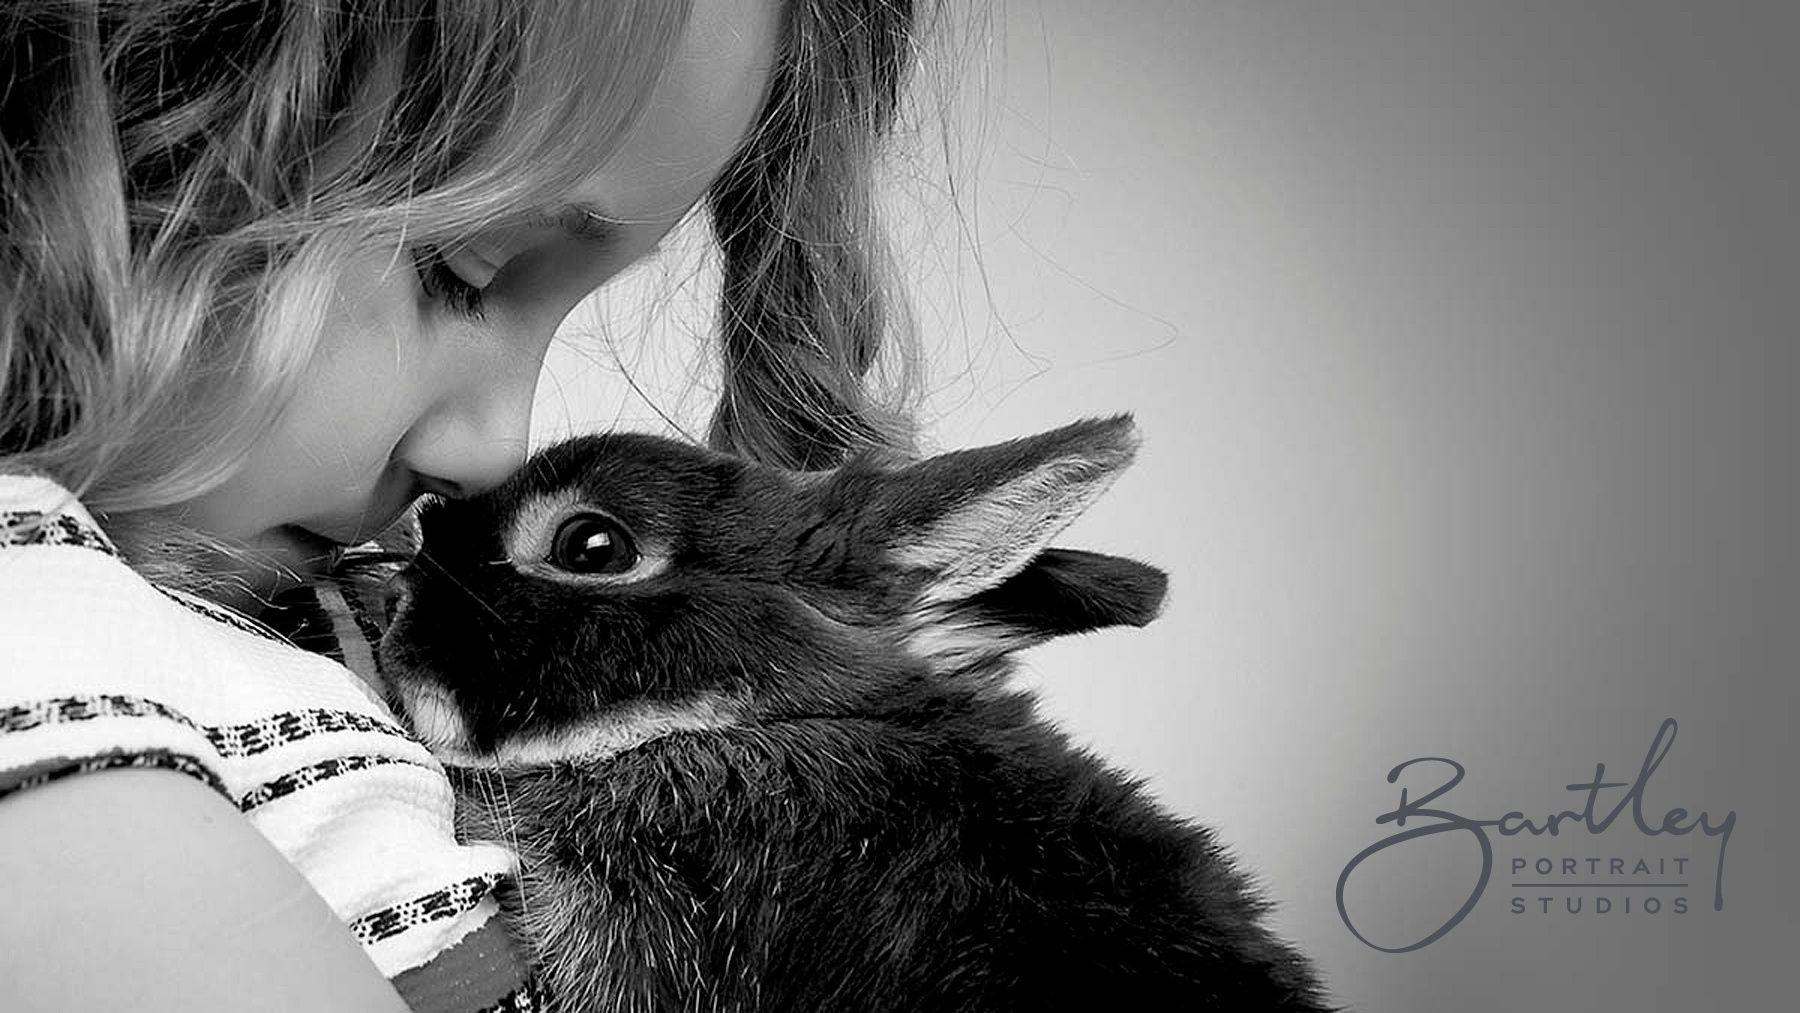 Child Photography Studio Pet Portraits Photography Pet Photography Studio Dog Portrait Photography